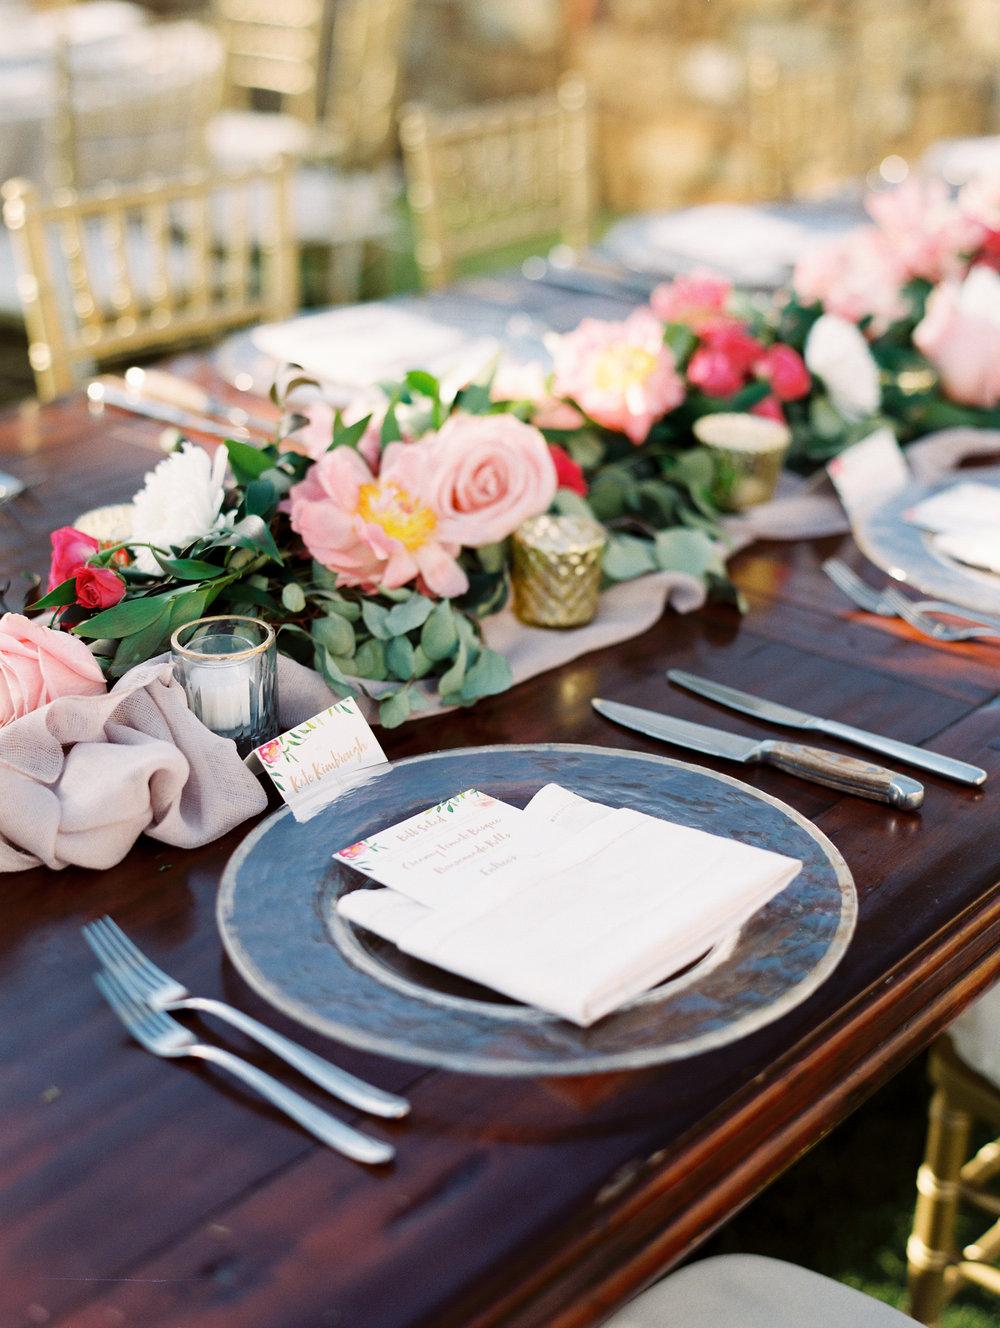 Escondido-Golf_Lake-Club-Hill-Country-Houston-Wedding-Photographer-Best-Top-Luxury-Destination-Engagements-Portrait-Austin-Photography-38.jpg